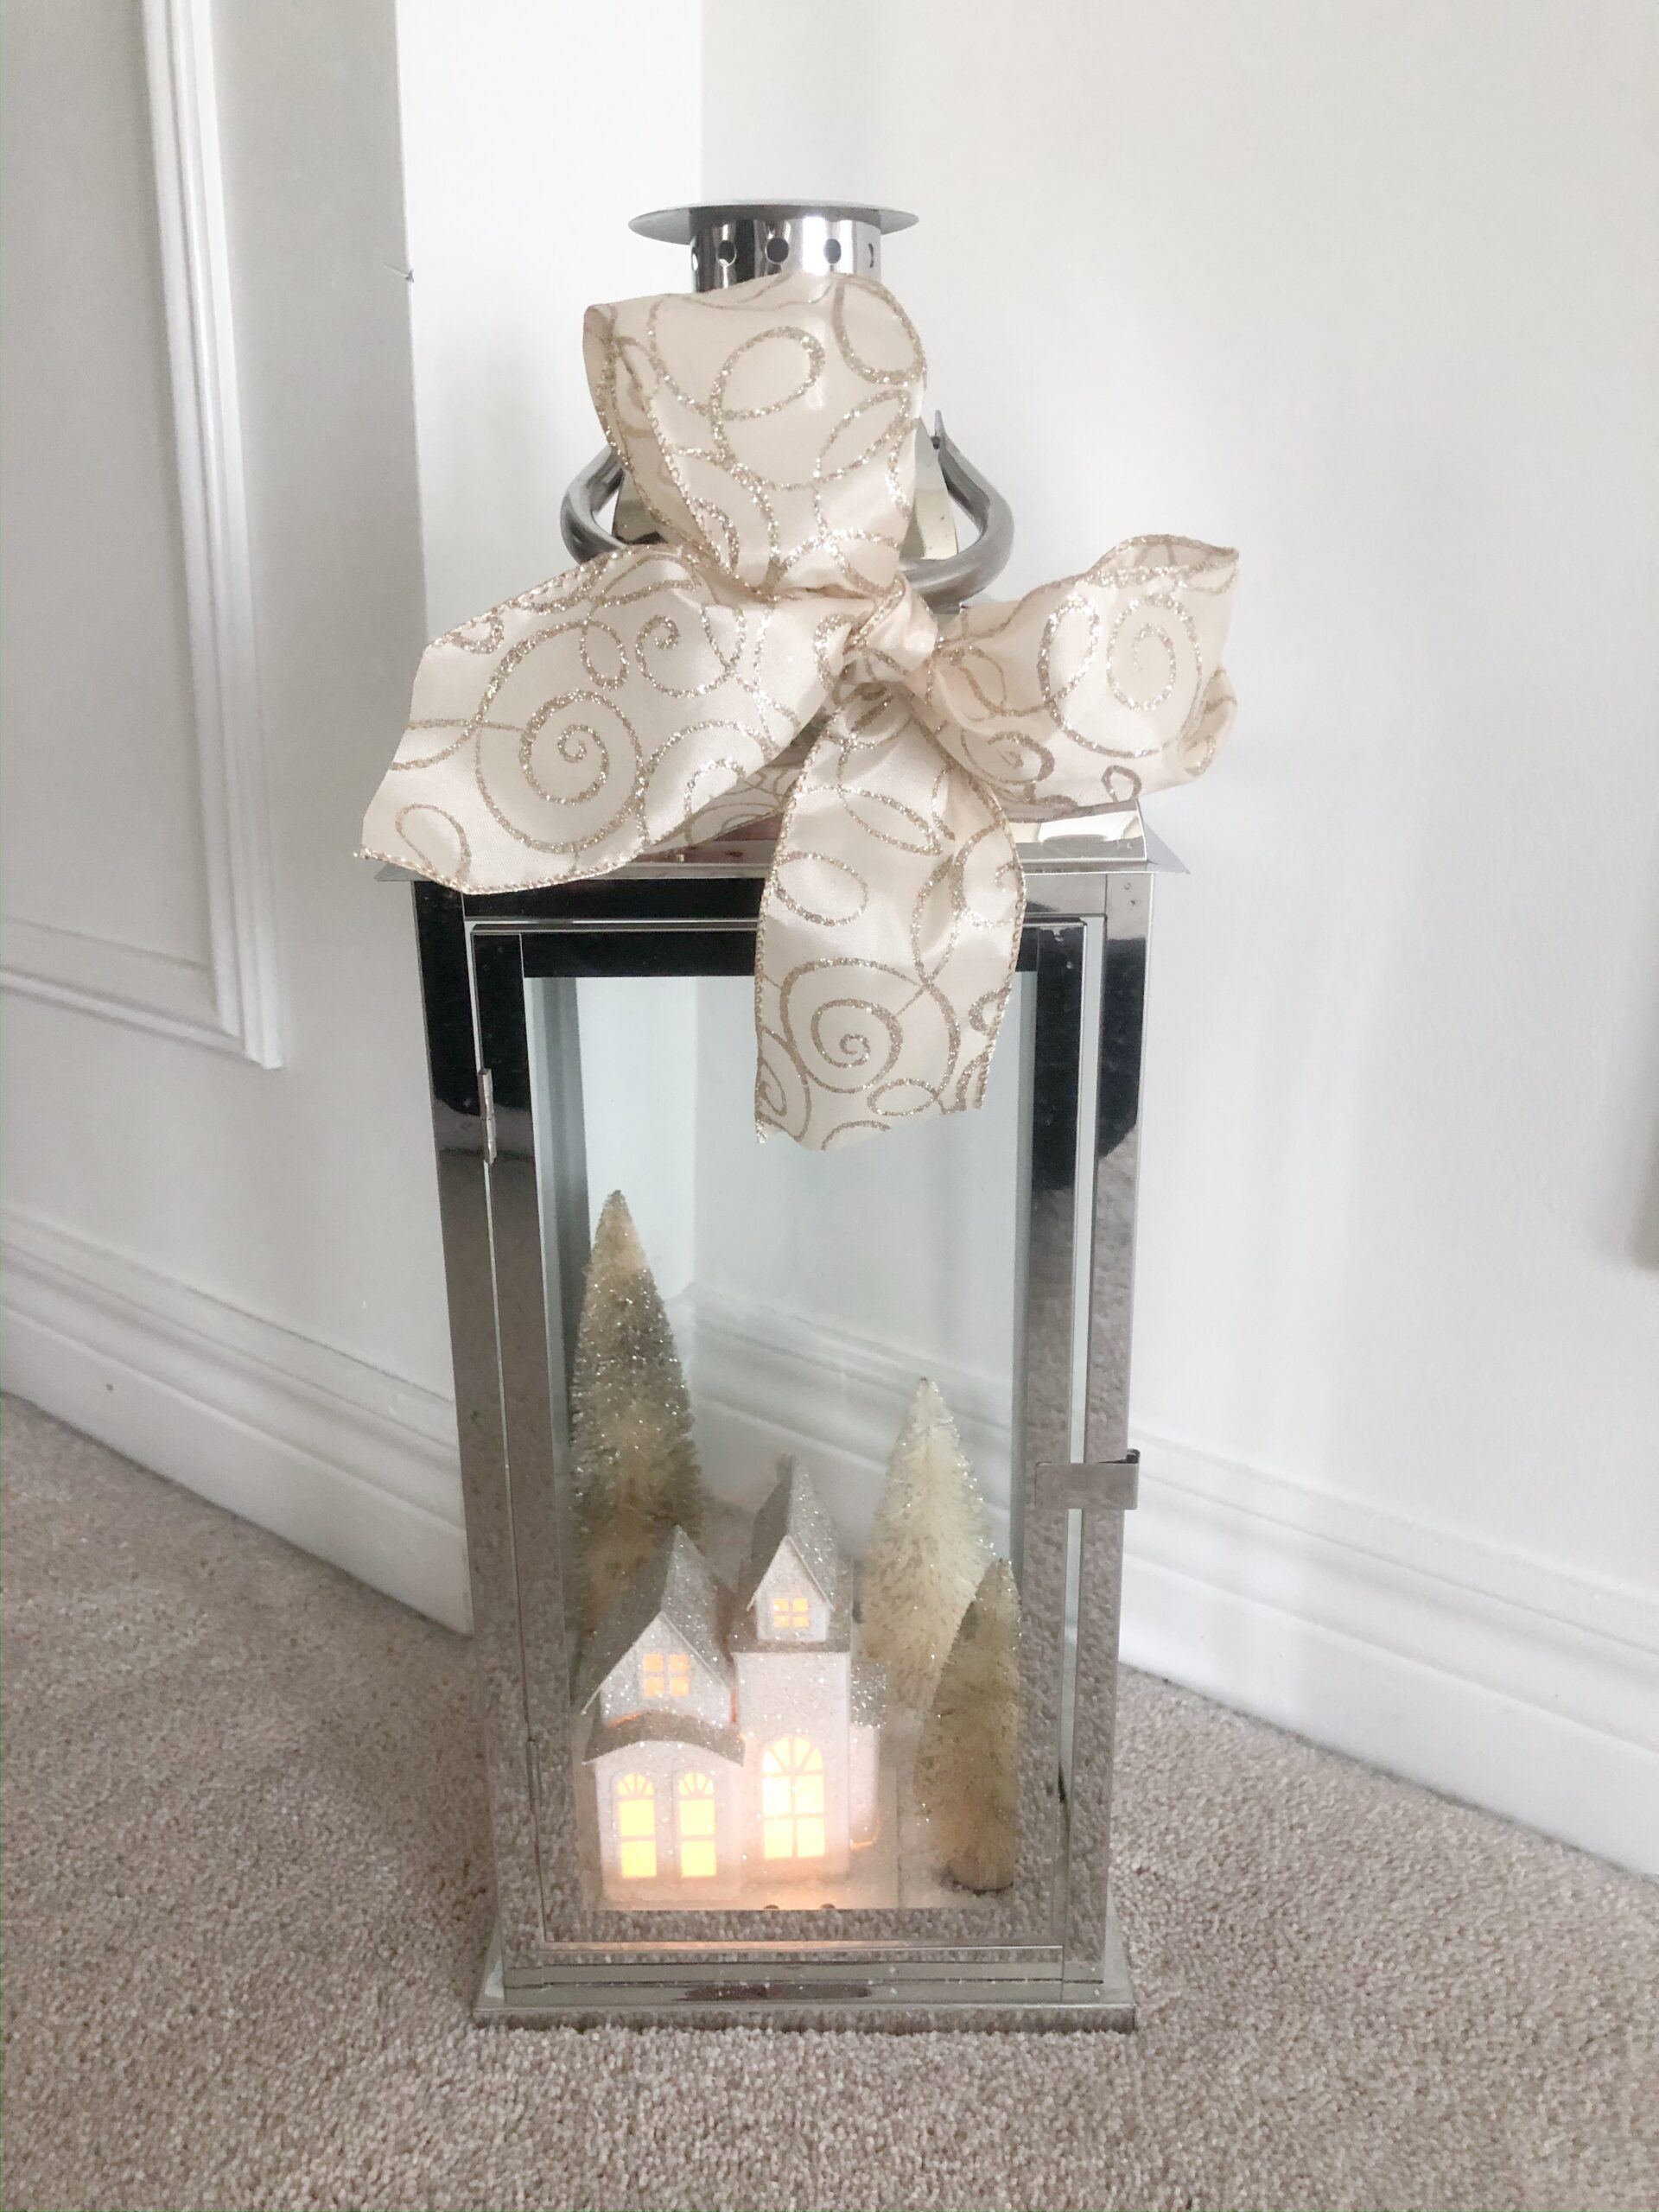 DIY Christmas Lantern on Livin' Life with Style